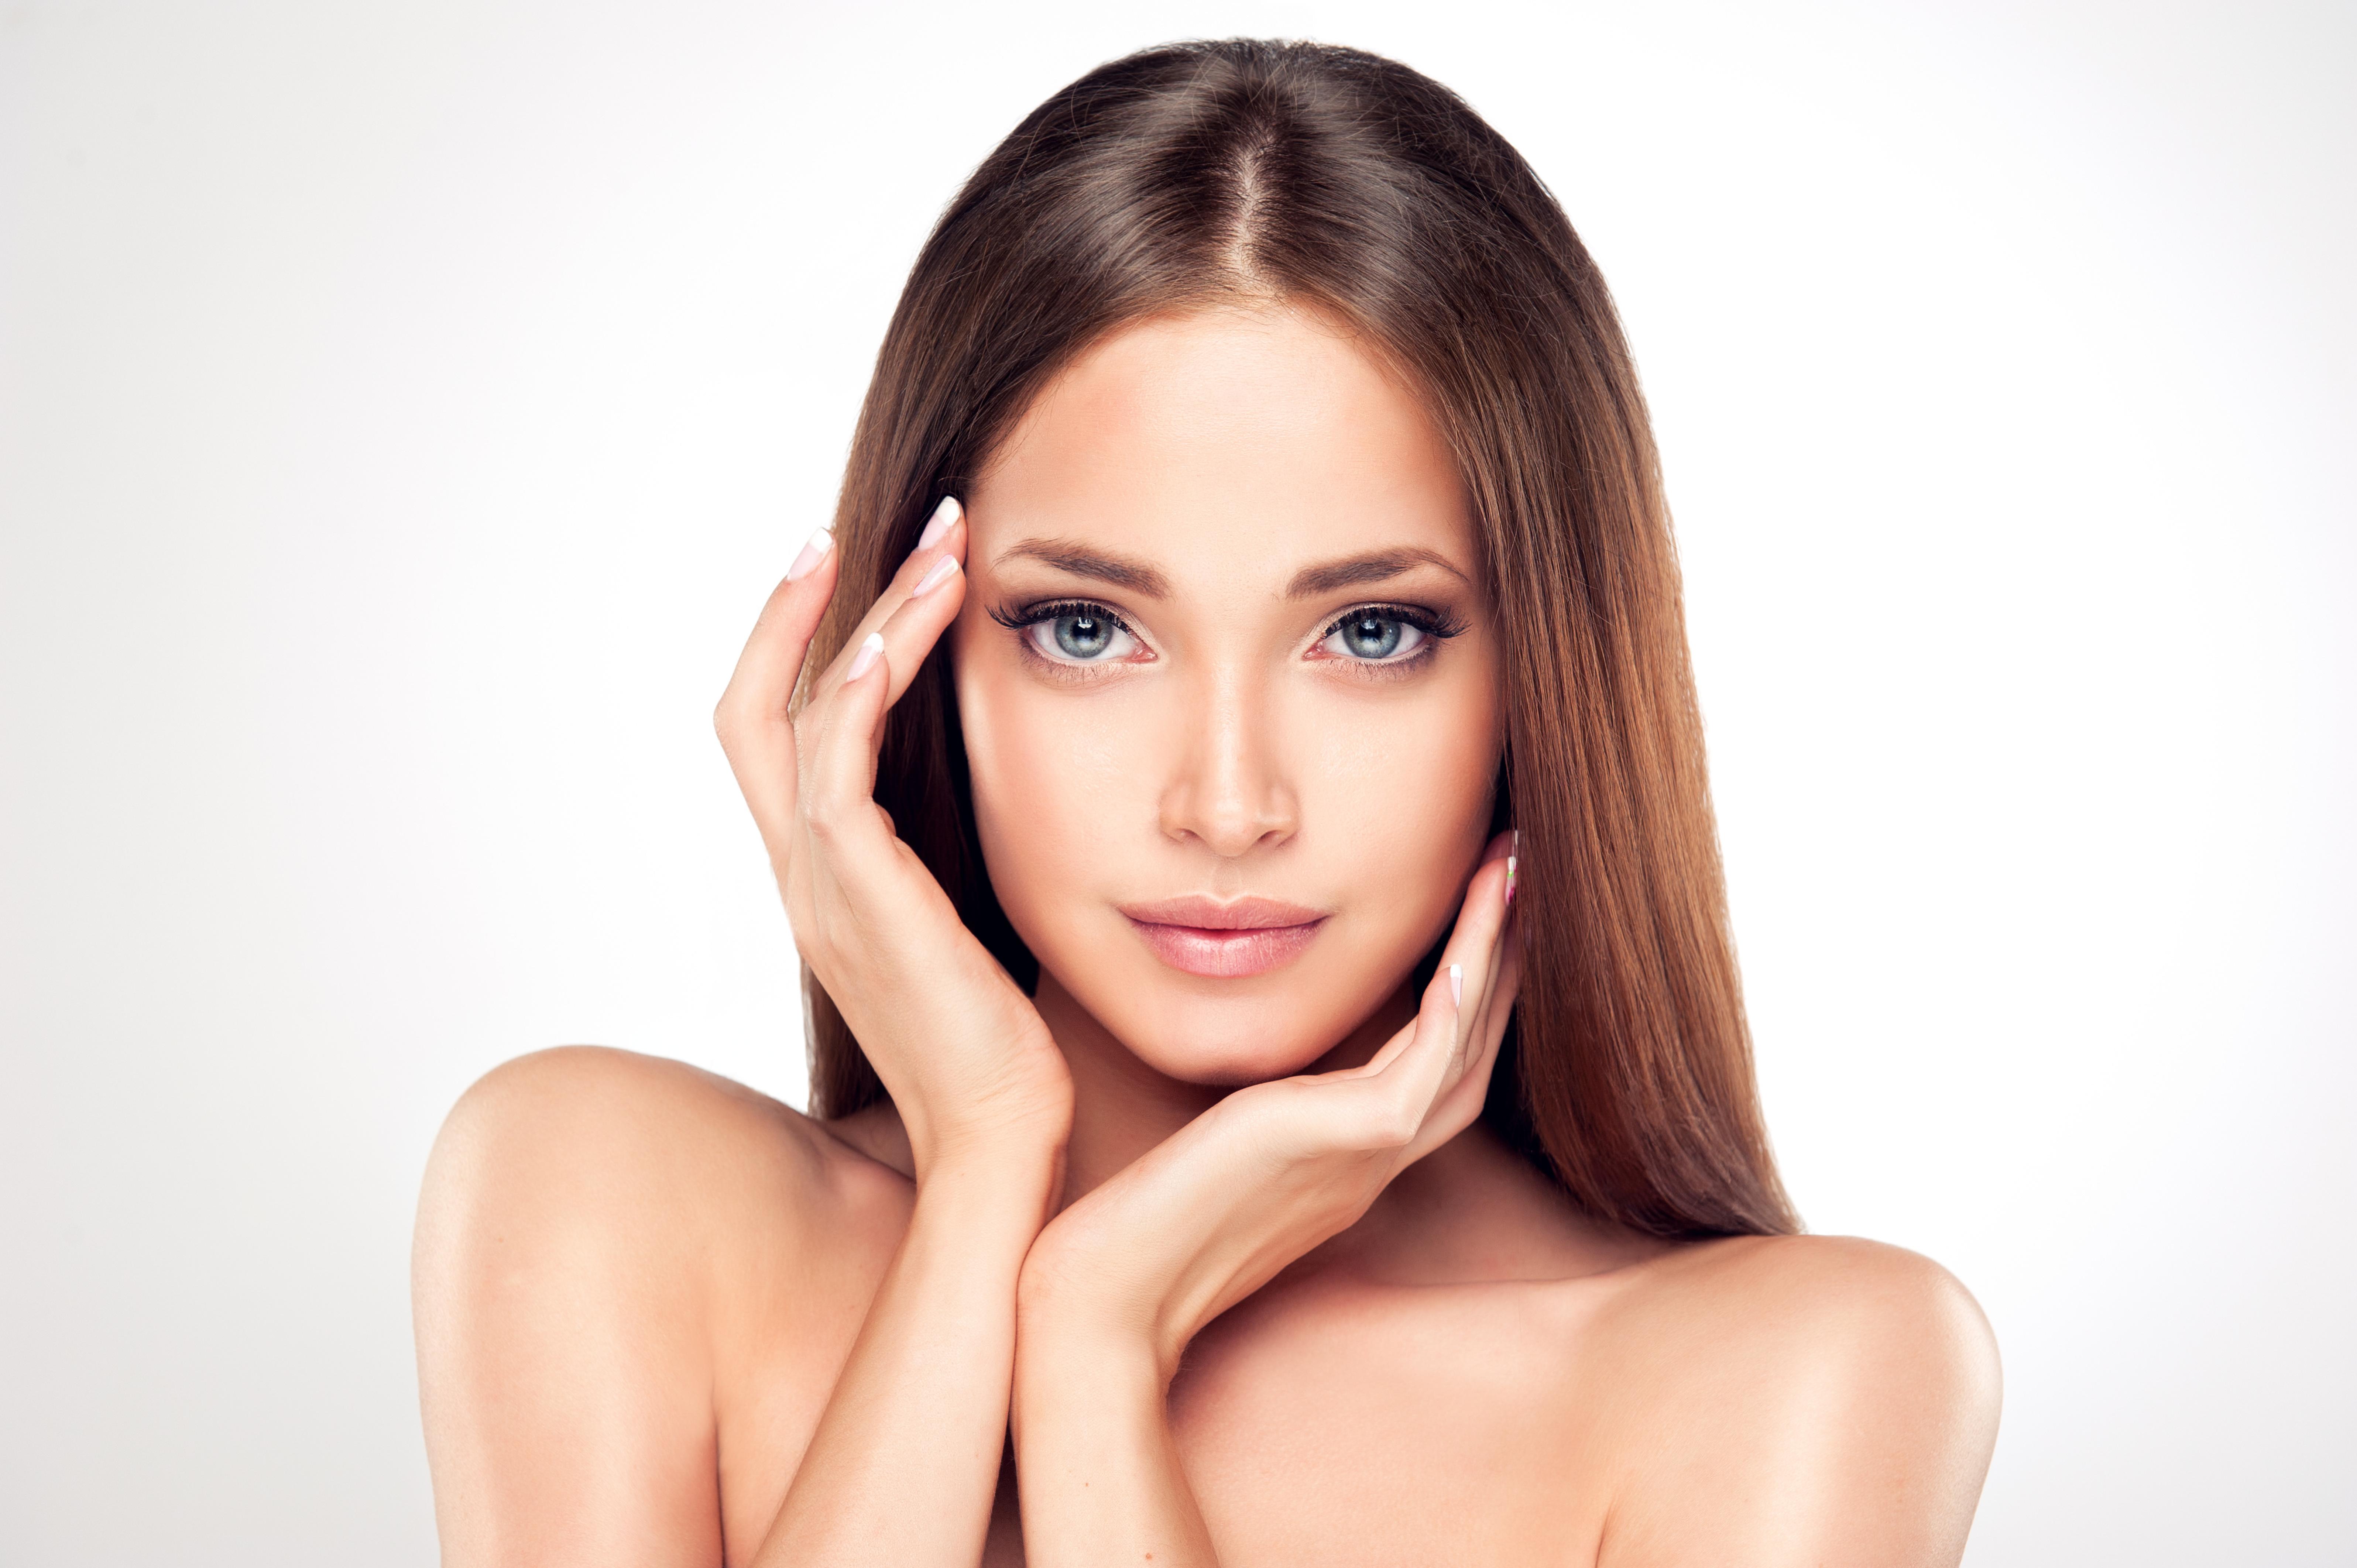 Adult Skin Care